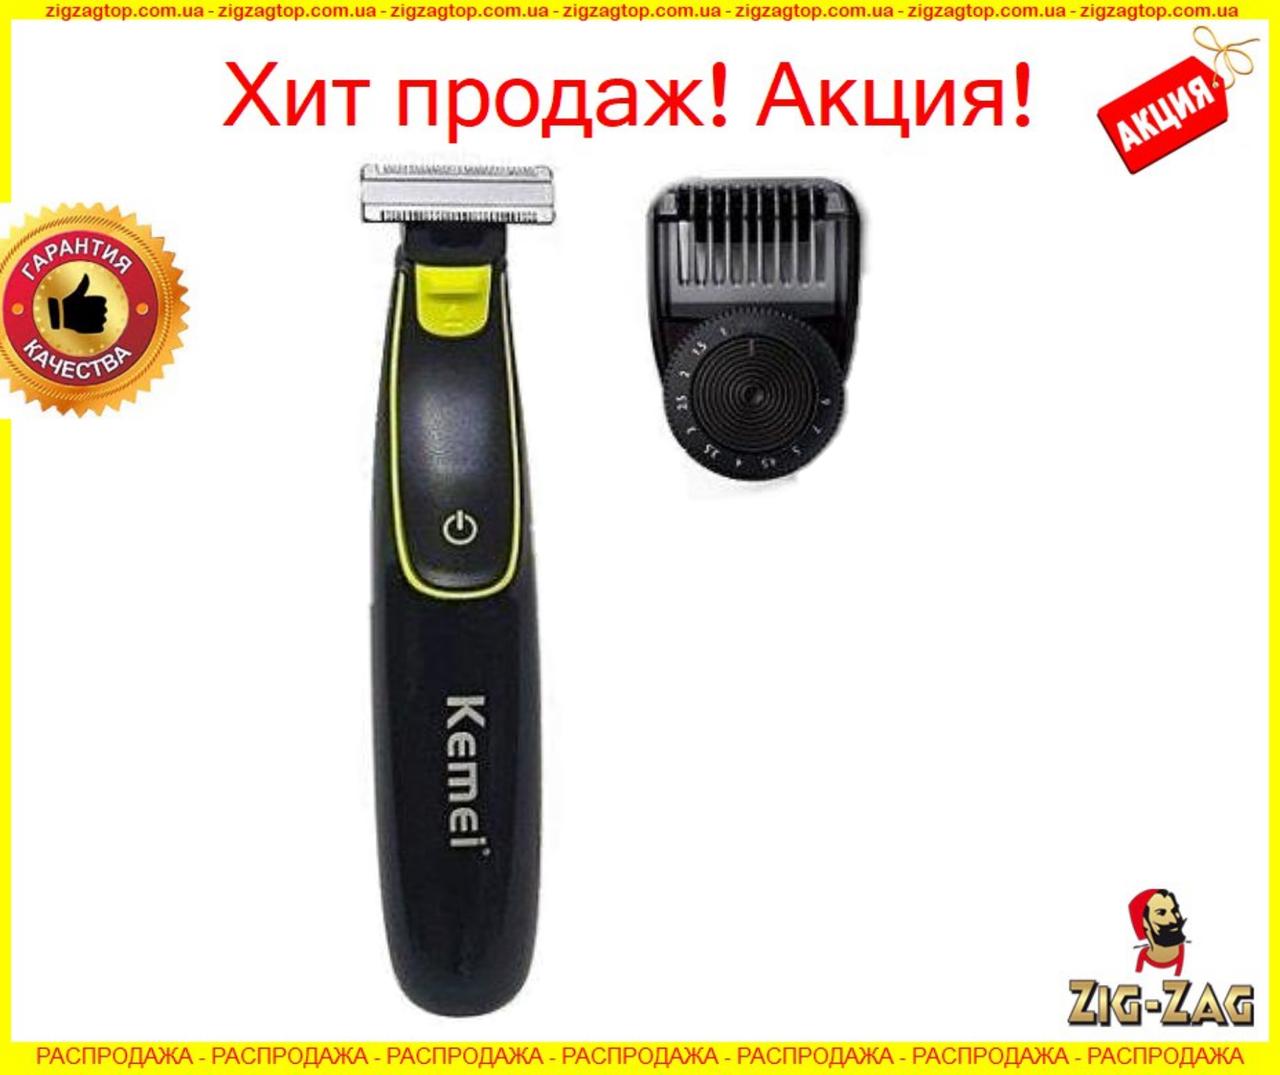 Электробритва триммер 2 в 1 Kemei Km-661 мужская, Комплект для бритья, бритва Мужская для бороды,бритва